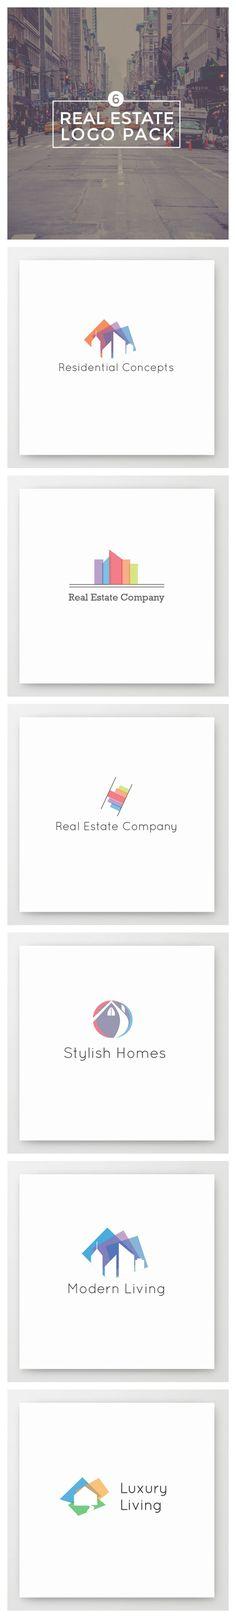 #Modern Real #Estate #Logo Pack | http://83oranges.com/product/modern-real-estate-logo-pack/?utm_content=bufferd1841&utm_medium=social&utm_source=pinterest.com&utm_campaign=buffer